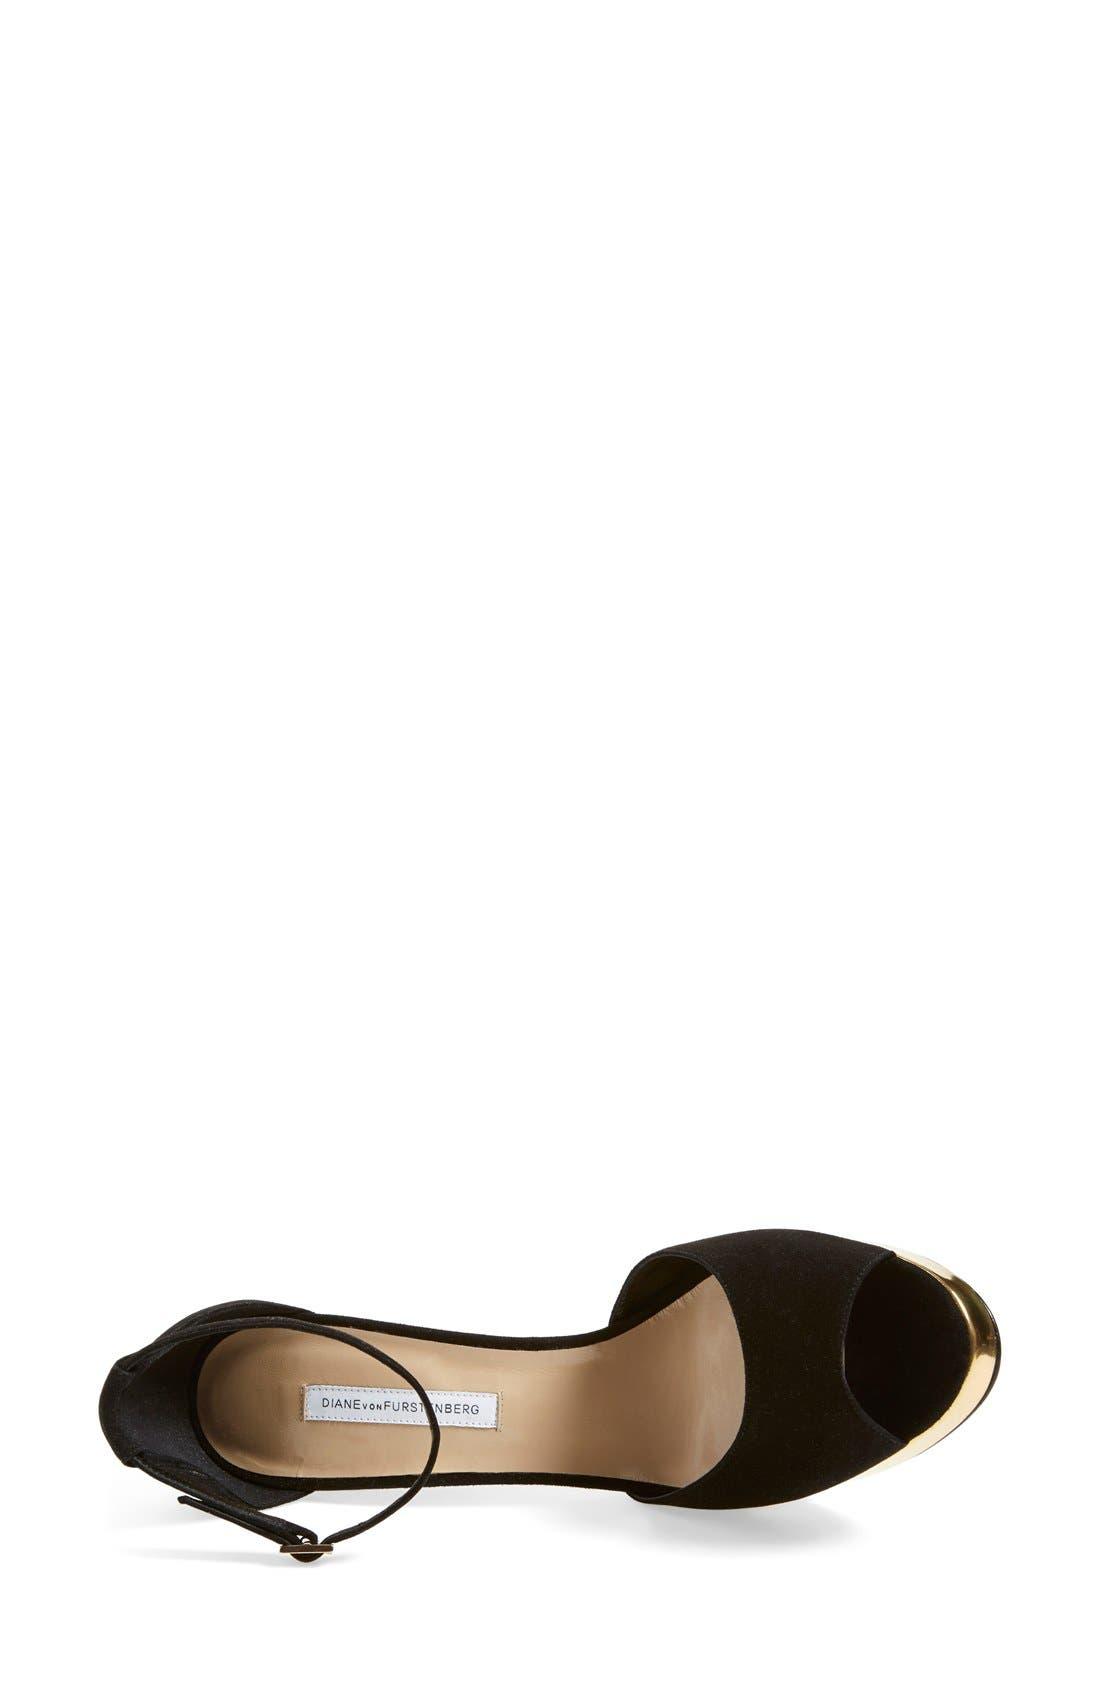 Alternate Image 3  - Diane von Furstenberg 'Daria' Platform Peep Toe Sandal (Women)